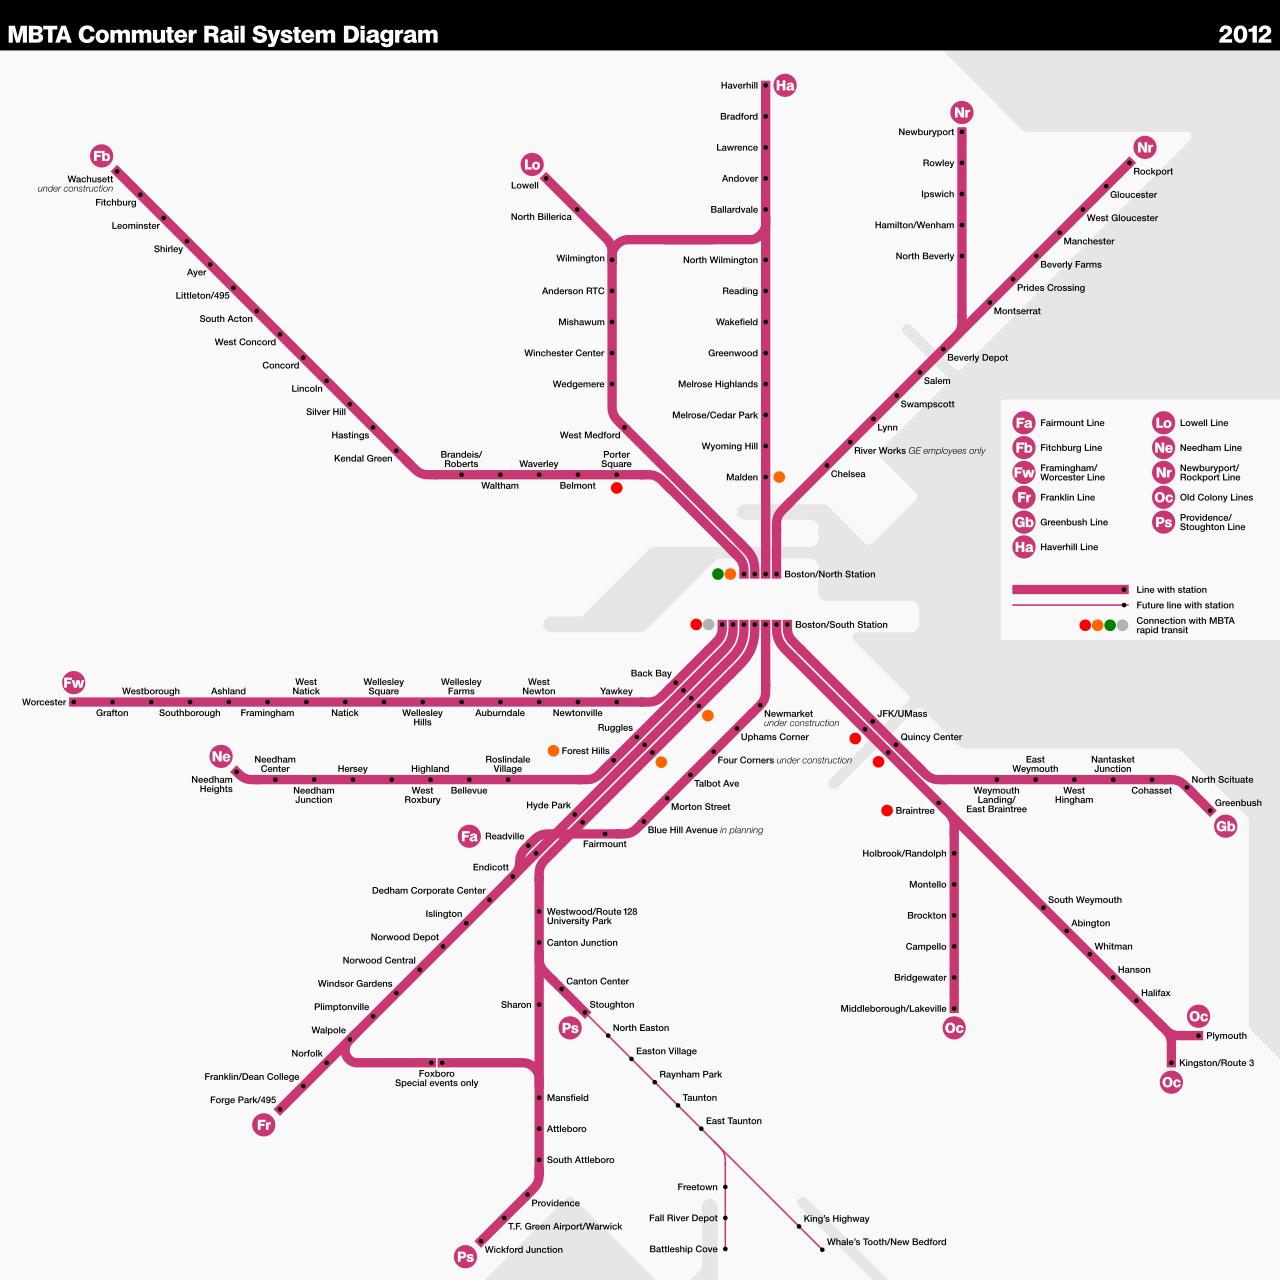 The Commuter Rail system in the Greater Boston area. Source:https://en.wikipedia.org/wiki/MBTA_Commuter_Rail